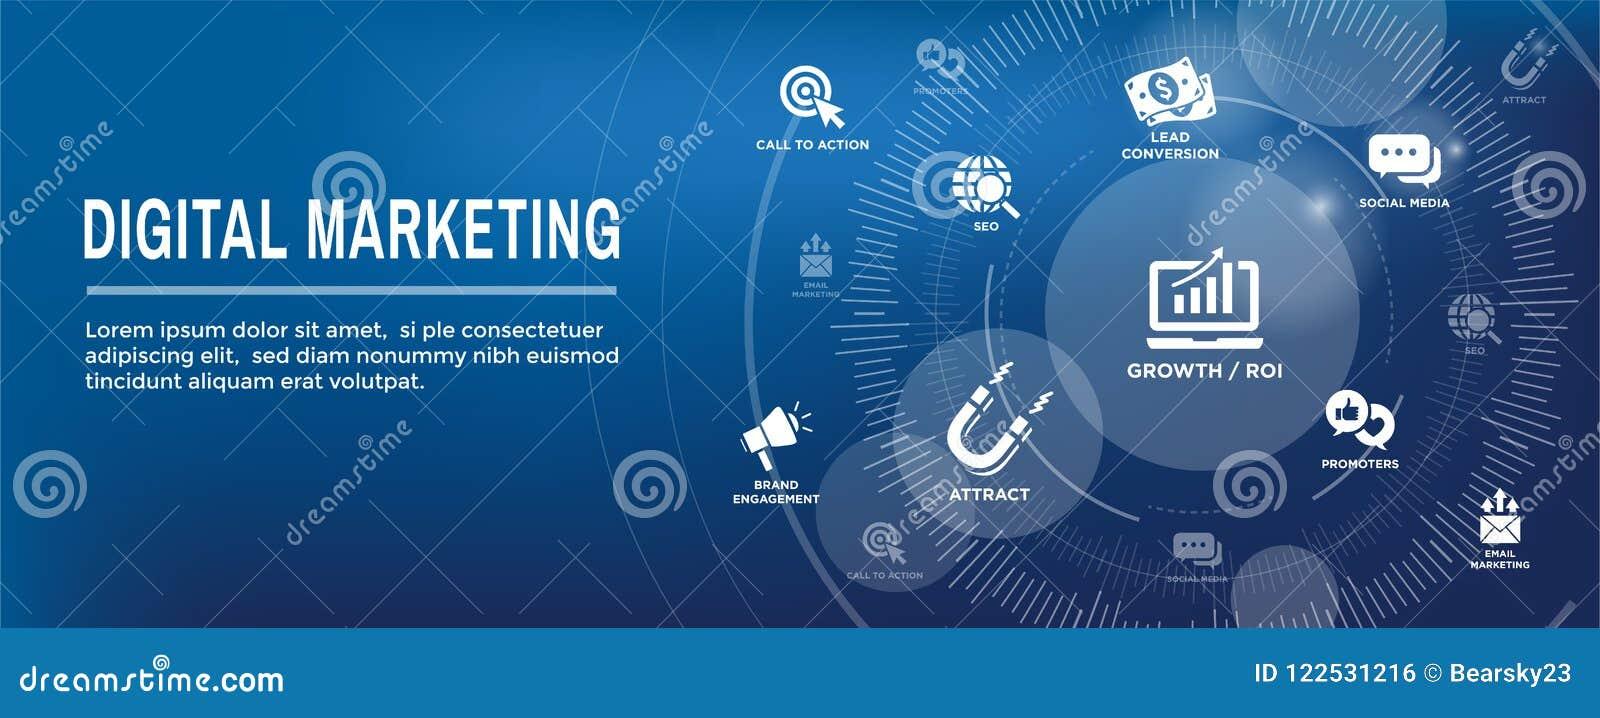 Digital-Inlandsmarketing-Netz-Fahne mit Vektor-Ikonen w CTA, GR